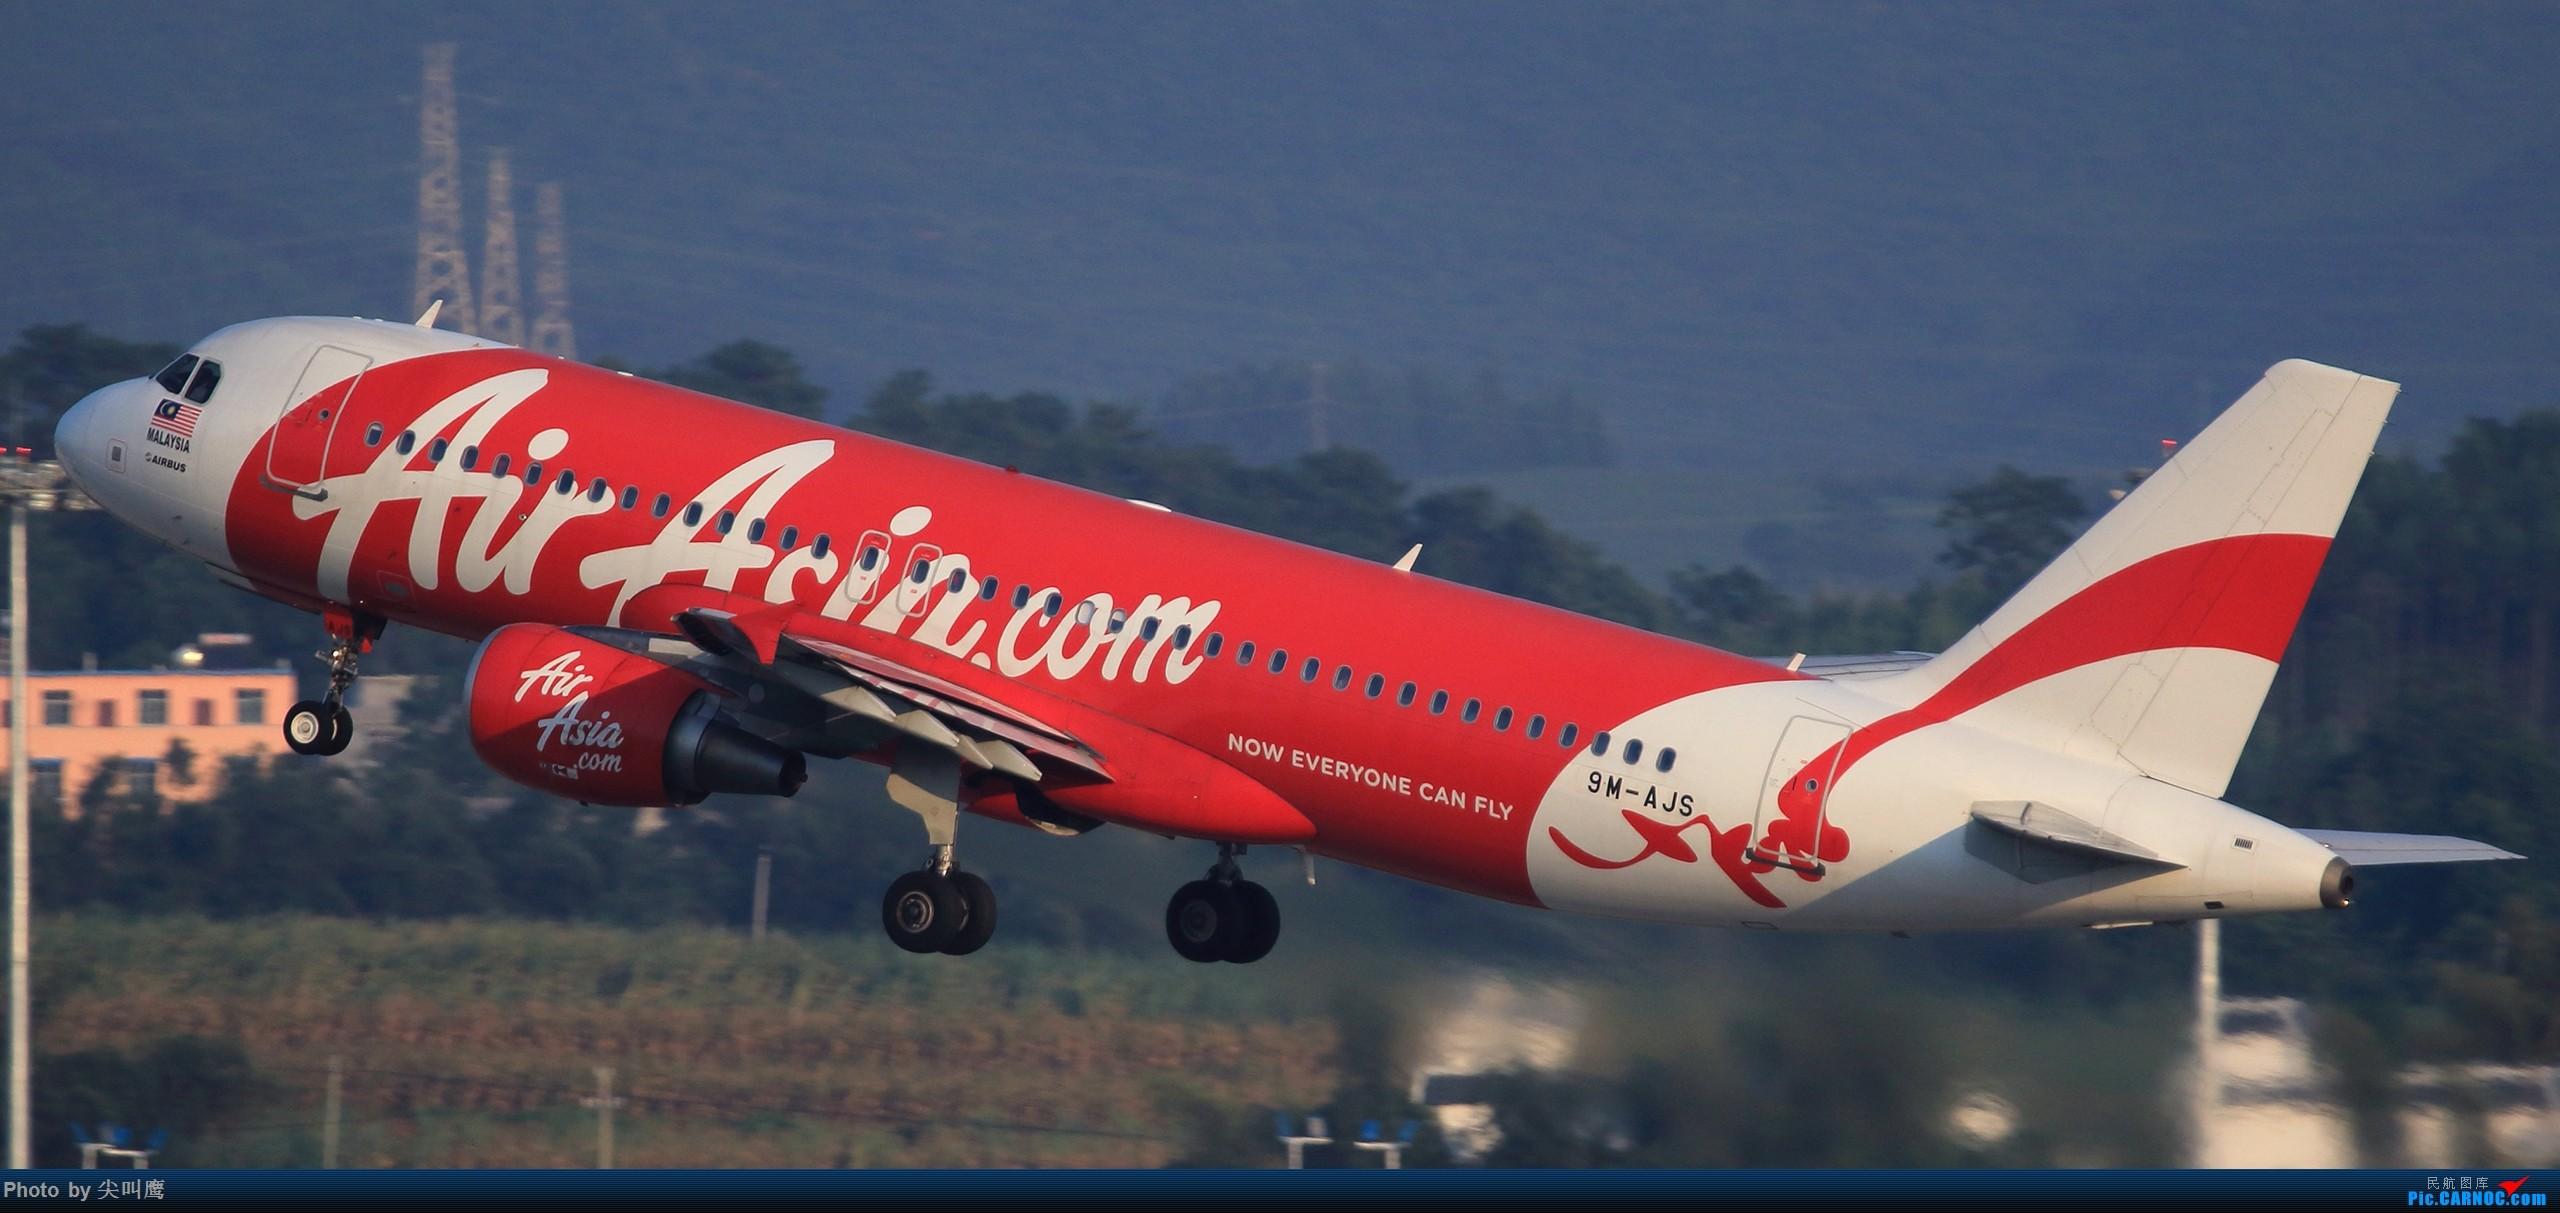 Re:[原创]NNG的亚航小合集 AIRBUS A320 9M-AJS 中国南宁吴圩国际机场